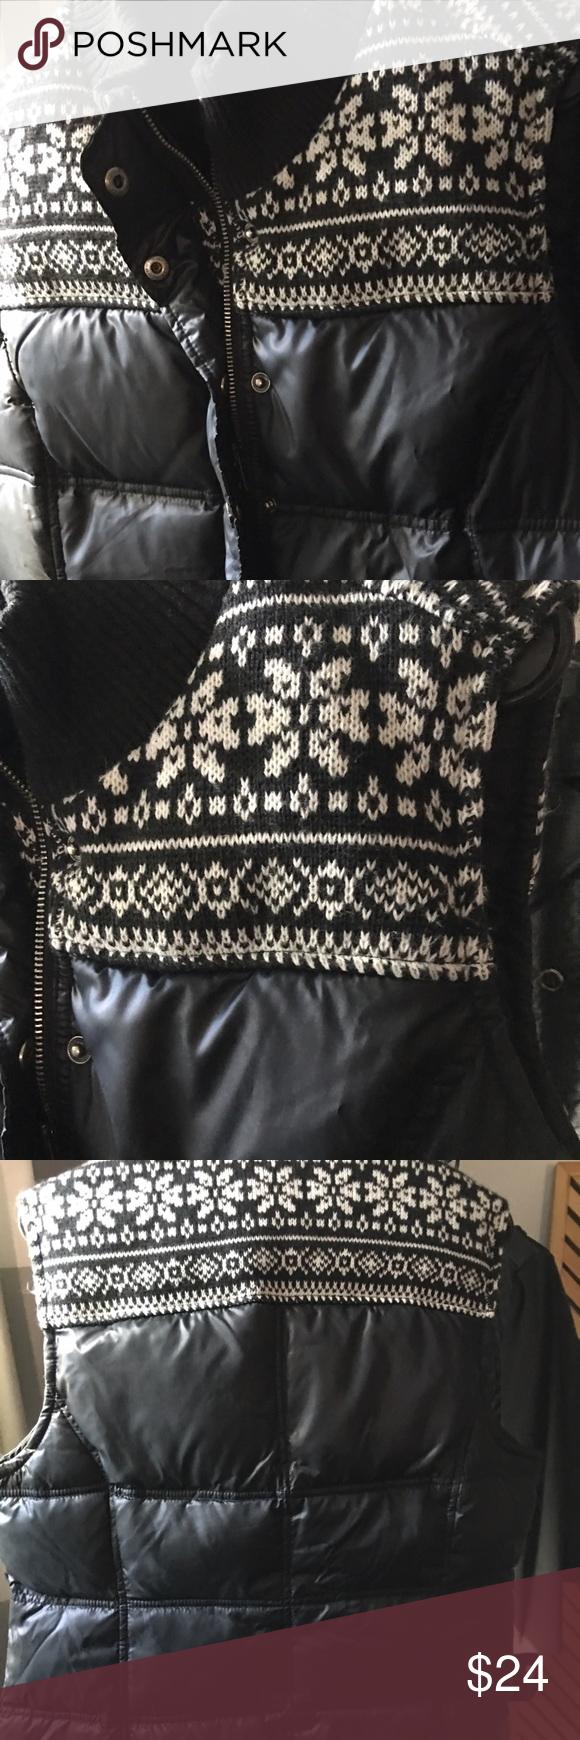 Tommy Hilfiger down style Vest Beautiful Tommy Hilfiger down style vest size:L Tommy Hilfiger Jackets & Coats Vests